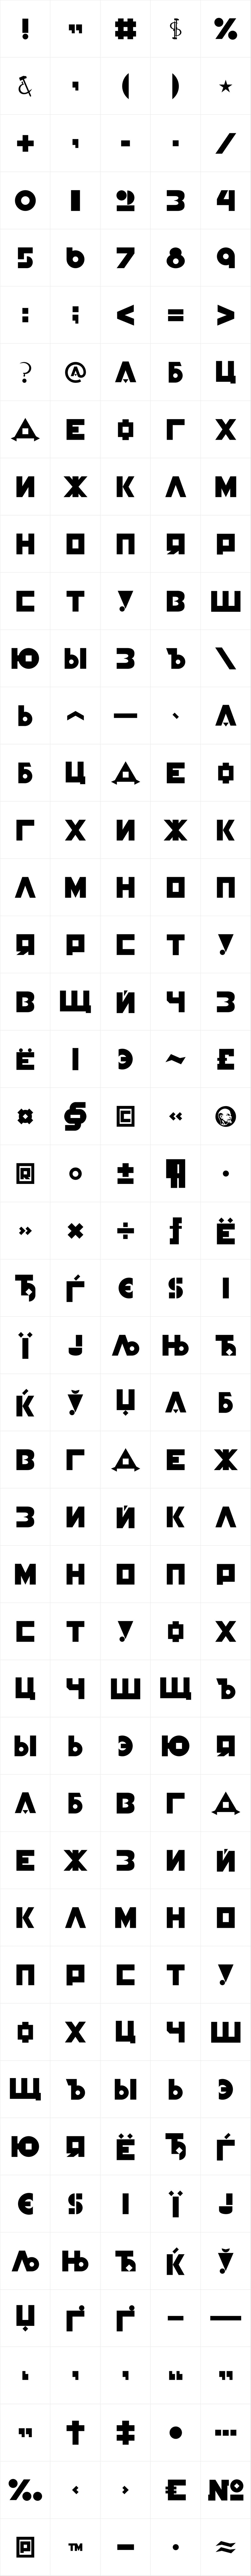 P22 Constructivist Cyrillic